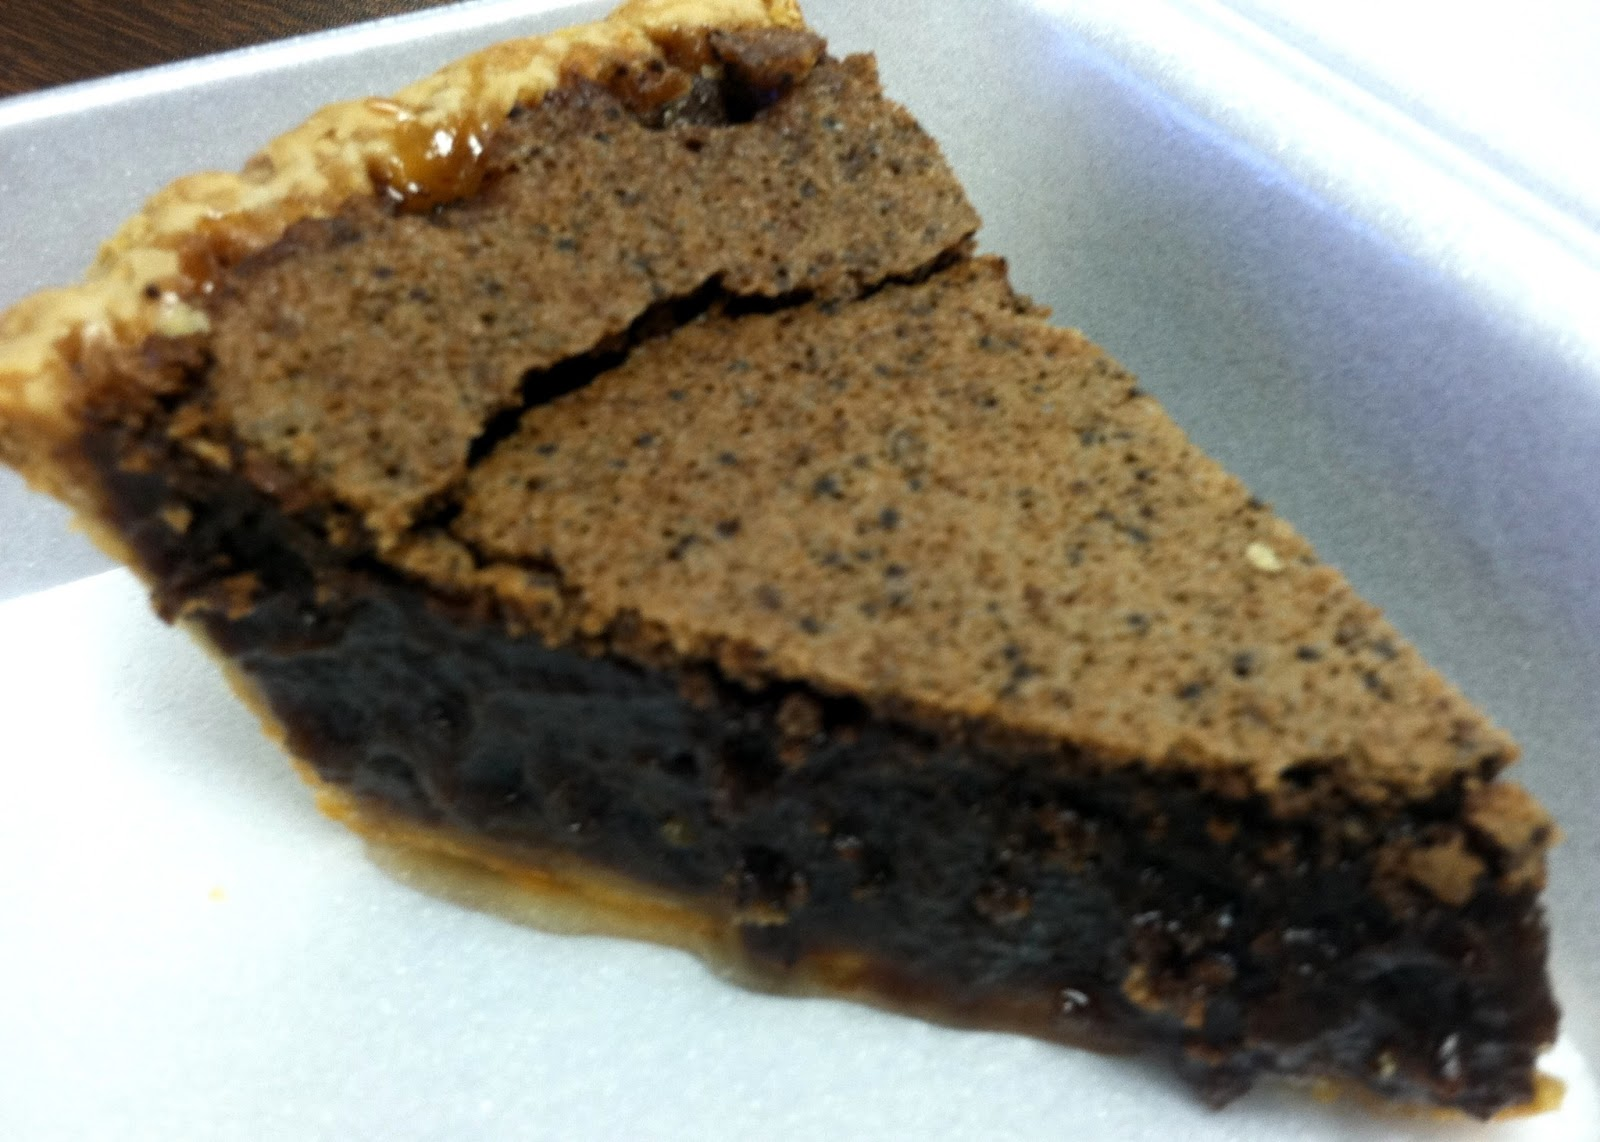 Chocolate Chess Pie - Dark, rich, velvety ooey-gooey chocolate